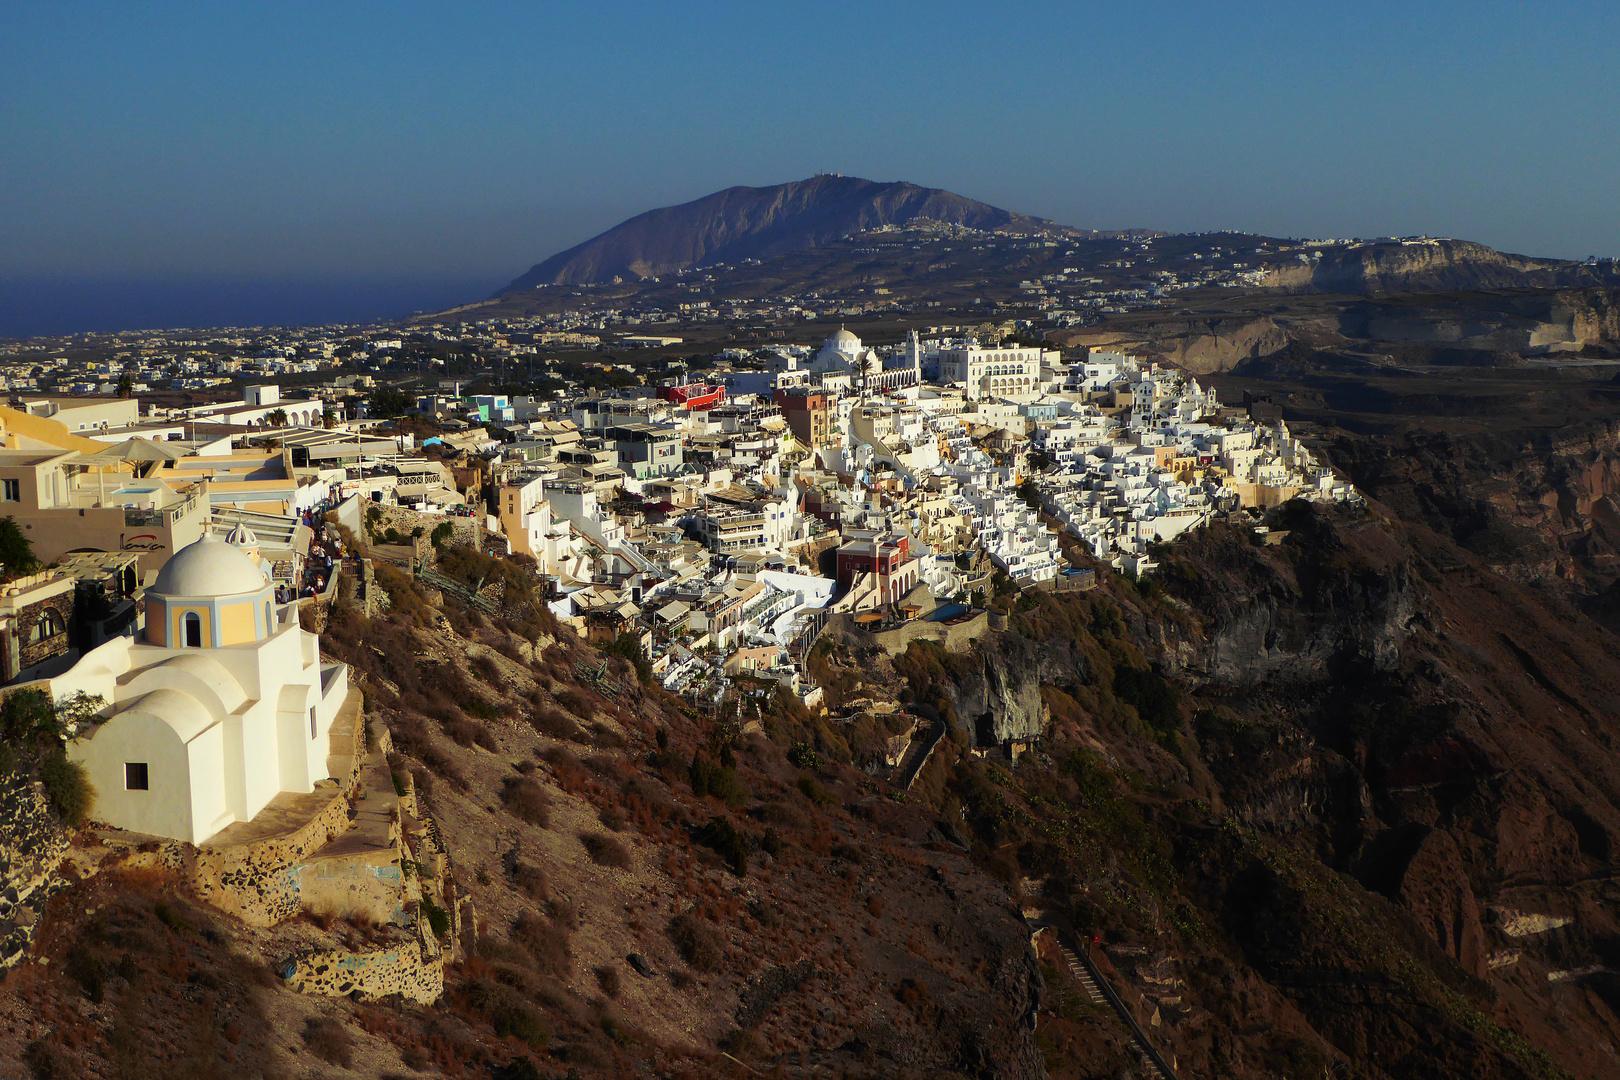 Santorini 2016, Fira 18